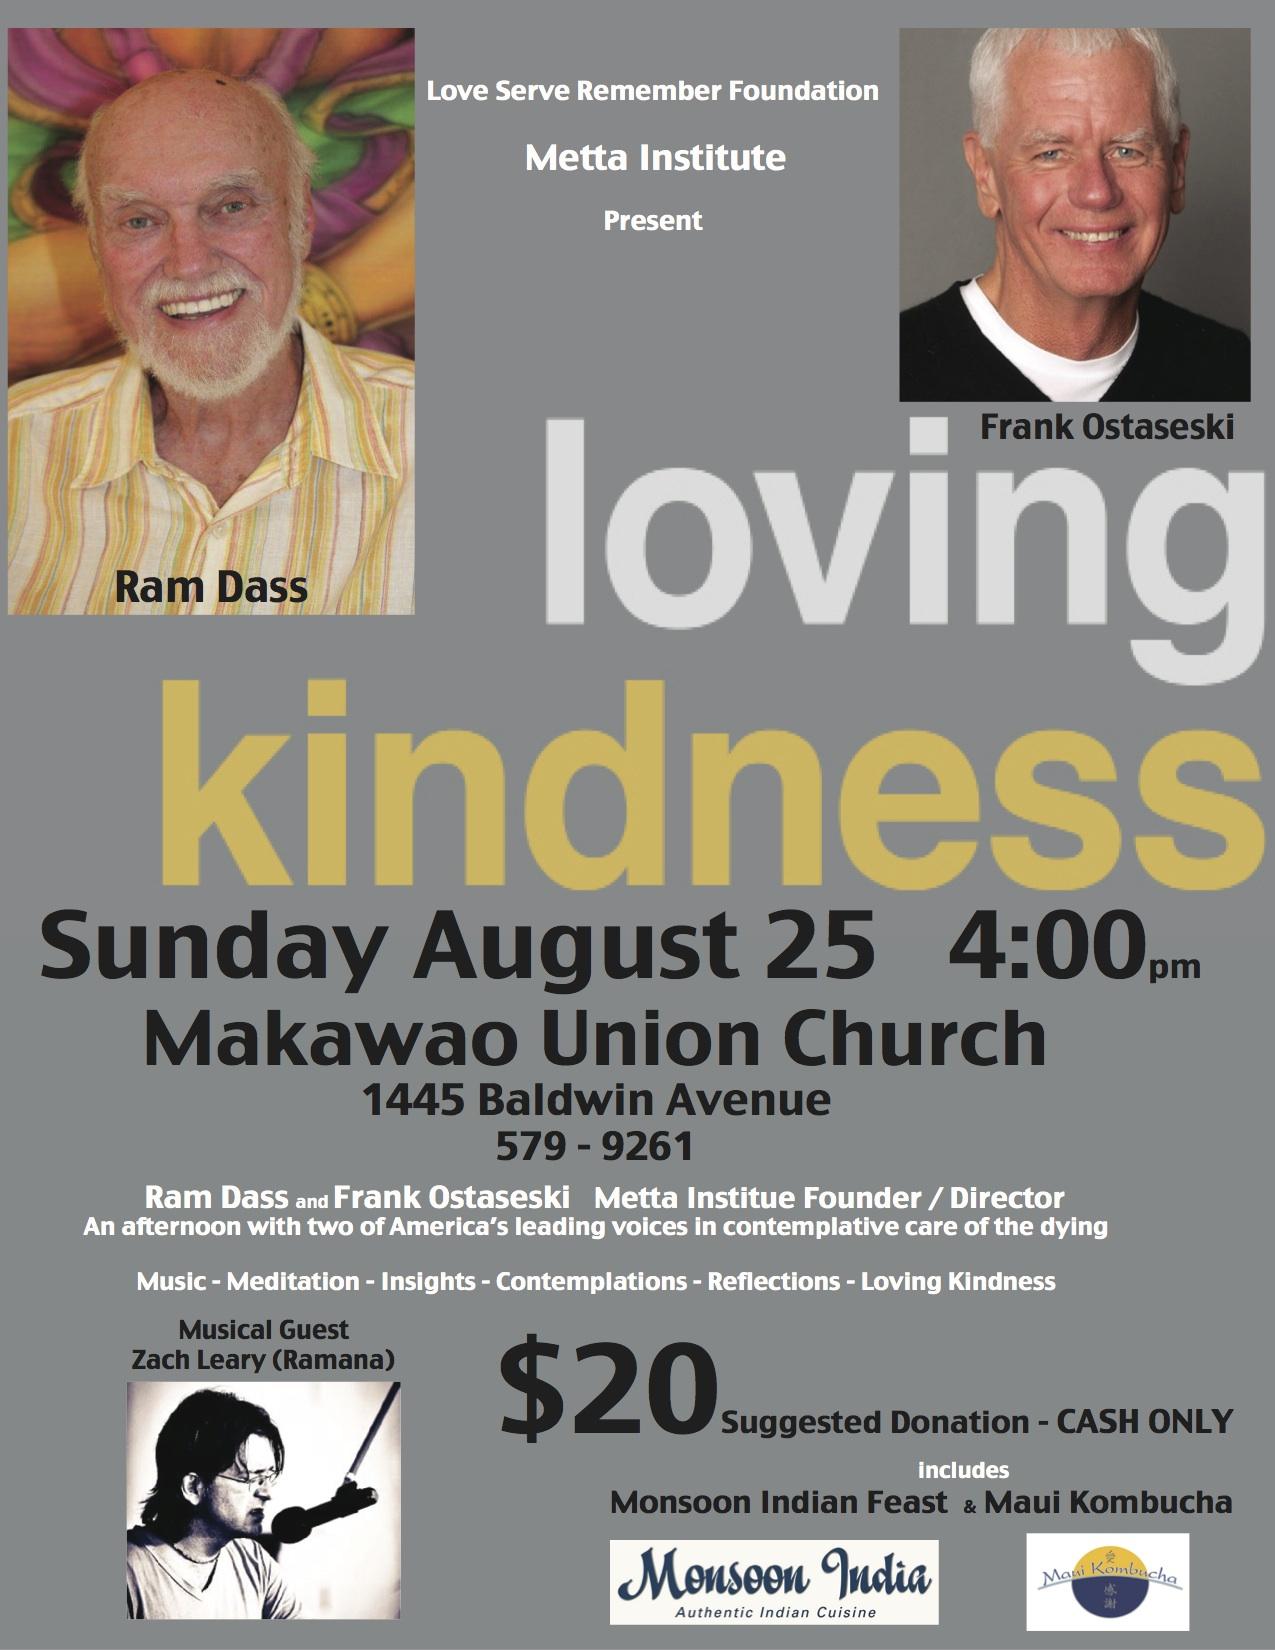 Loving Kindness Satsang with Ram Dass, Frank Ostaseski and Zach Leary (Ramana)